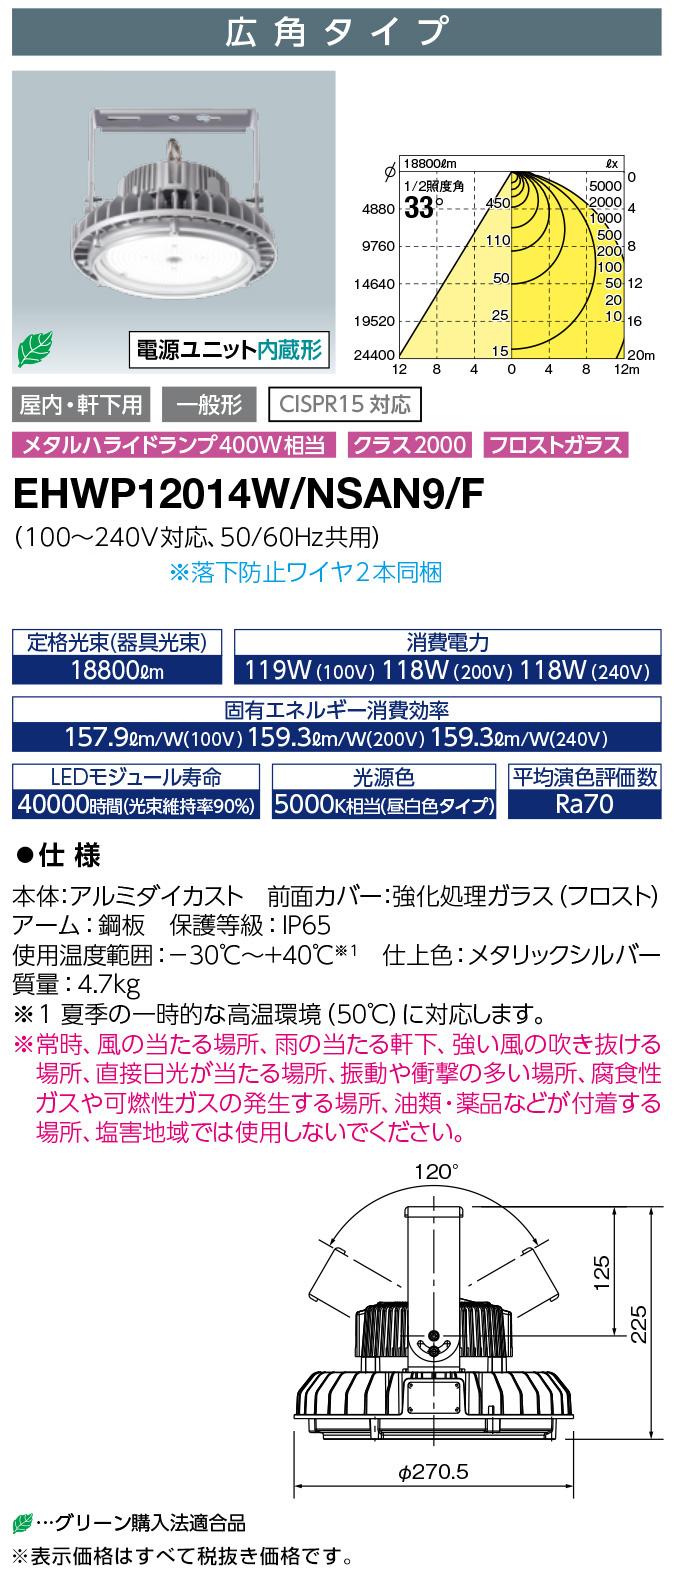 EHWP12014W/NSAN9/F